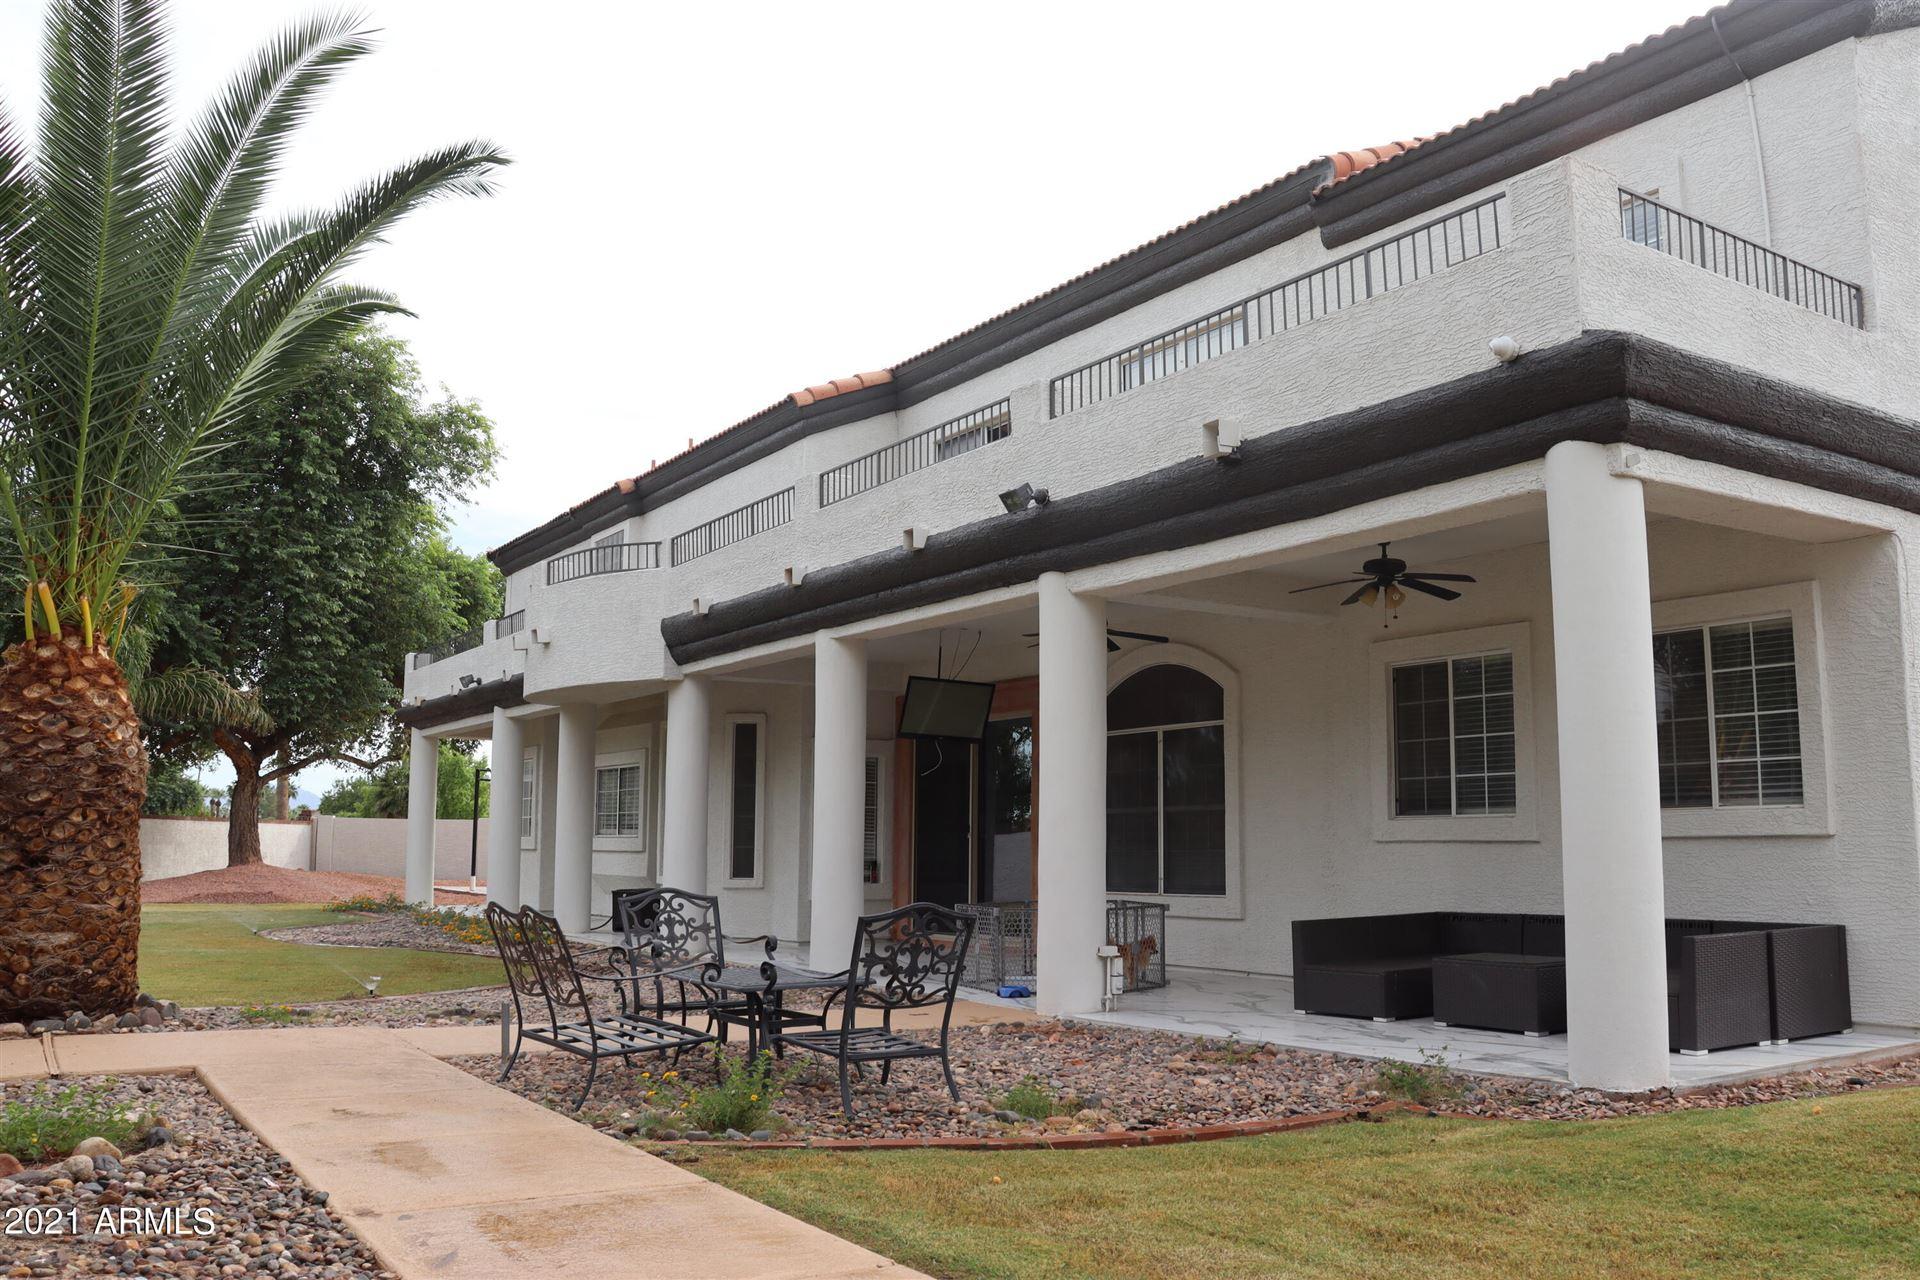 Photo of 4801 N LITCHFIELD Knoll, Litchfield Park, AZ 85340 (MLS # 6305489)